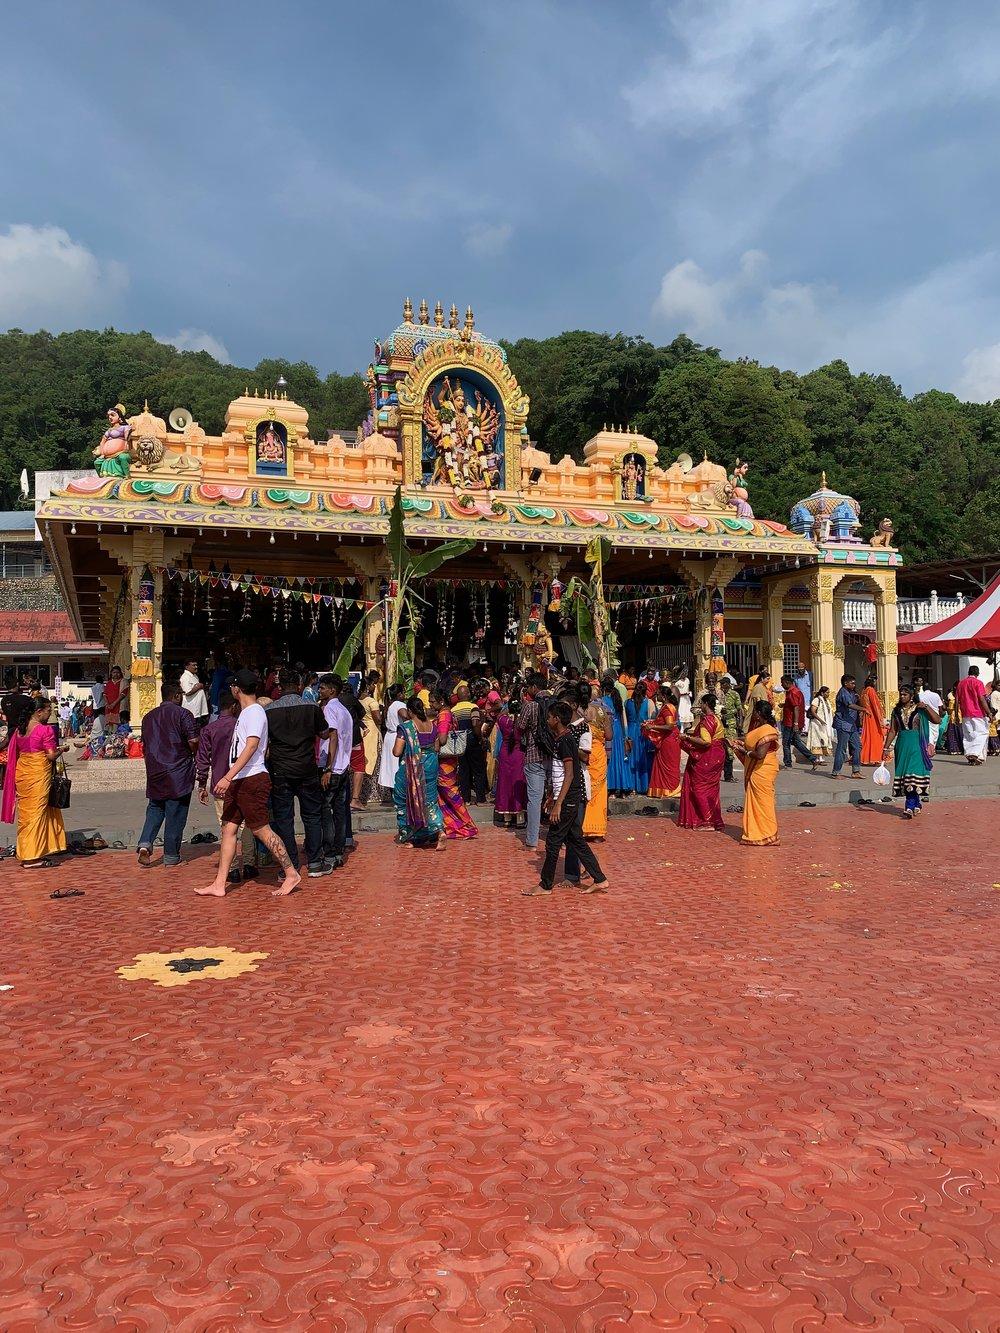 The Kali Temple on Pangkor Island